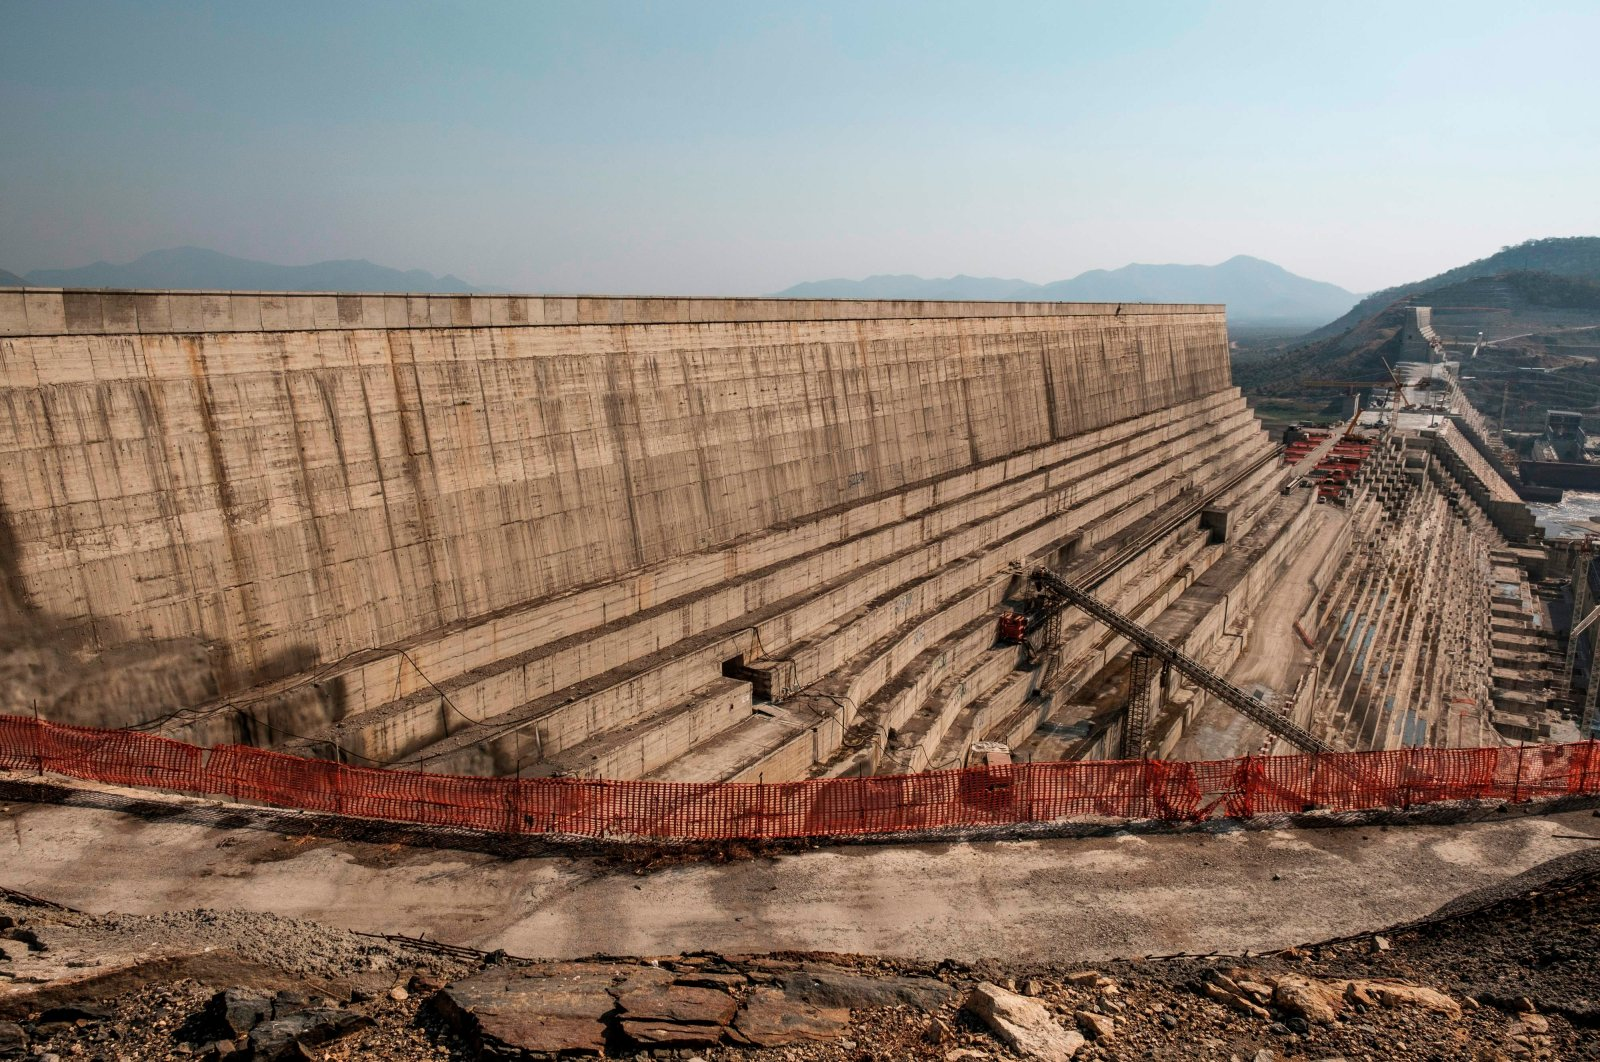 A general view of the Grand Ethiopian Renaissance Dam (GERD), near Guba in Ethiopia, Dec. 26, 2019. (AFP)